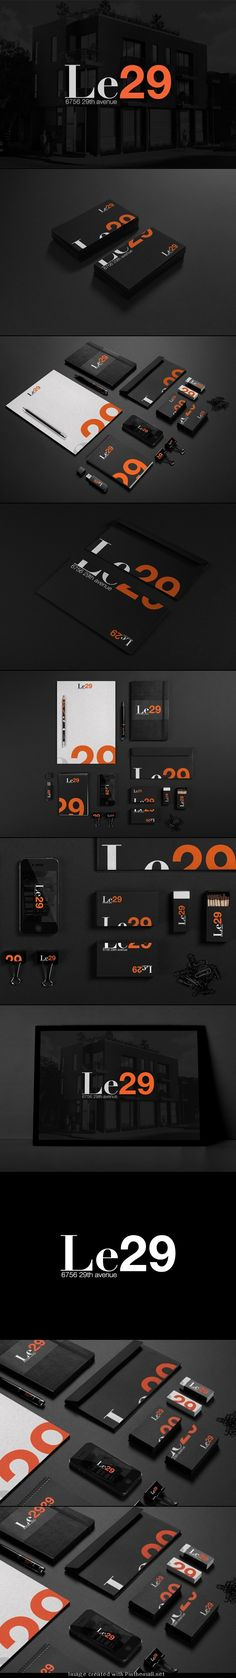 graphic design, logo, le29 ident